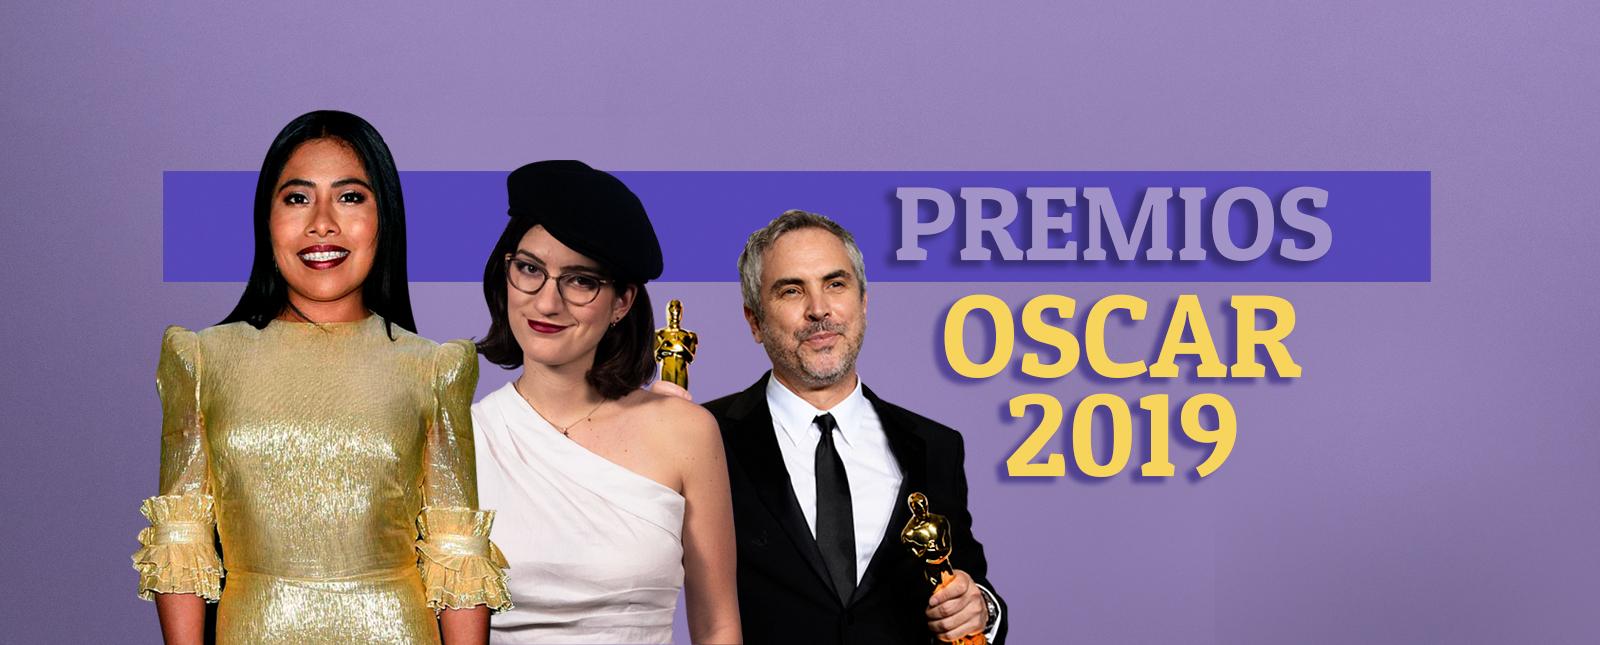 ¡Prepárate para los Premios Oscar 2019! (Ep. 70) | WEEKLY UPDATE